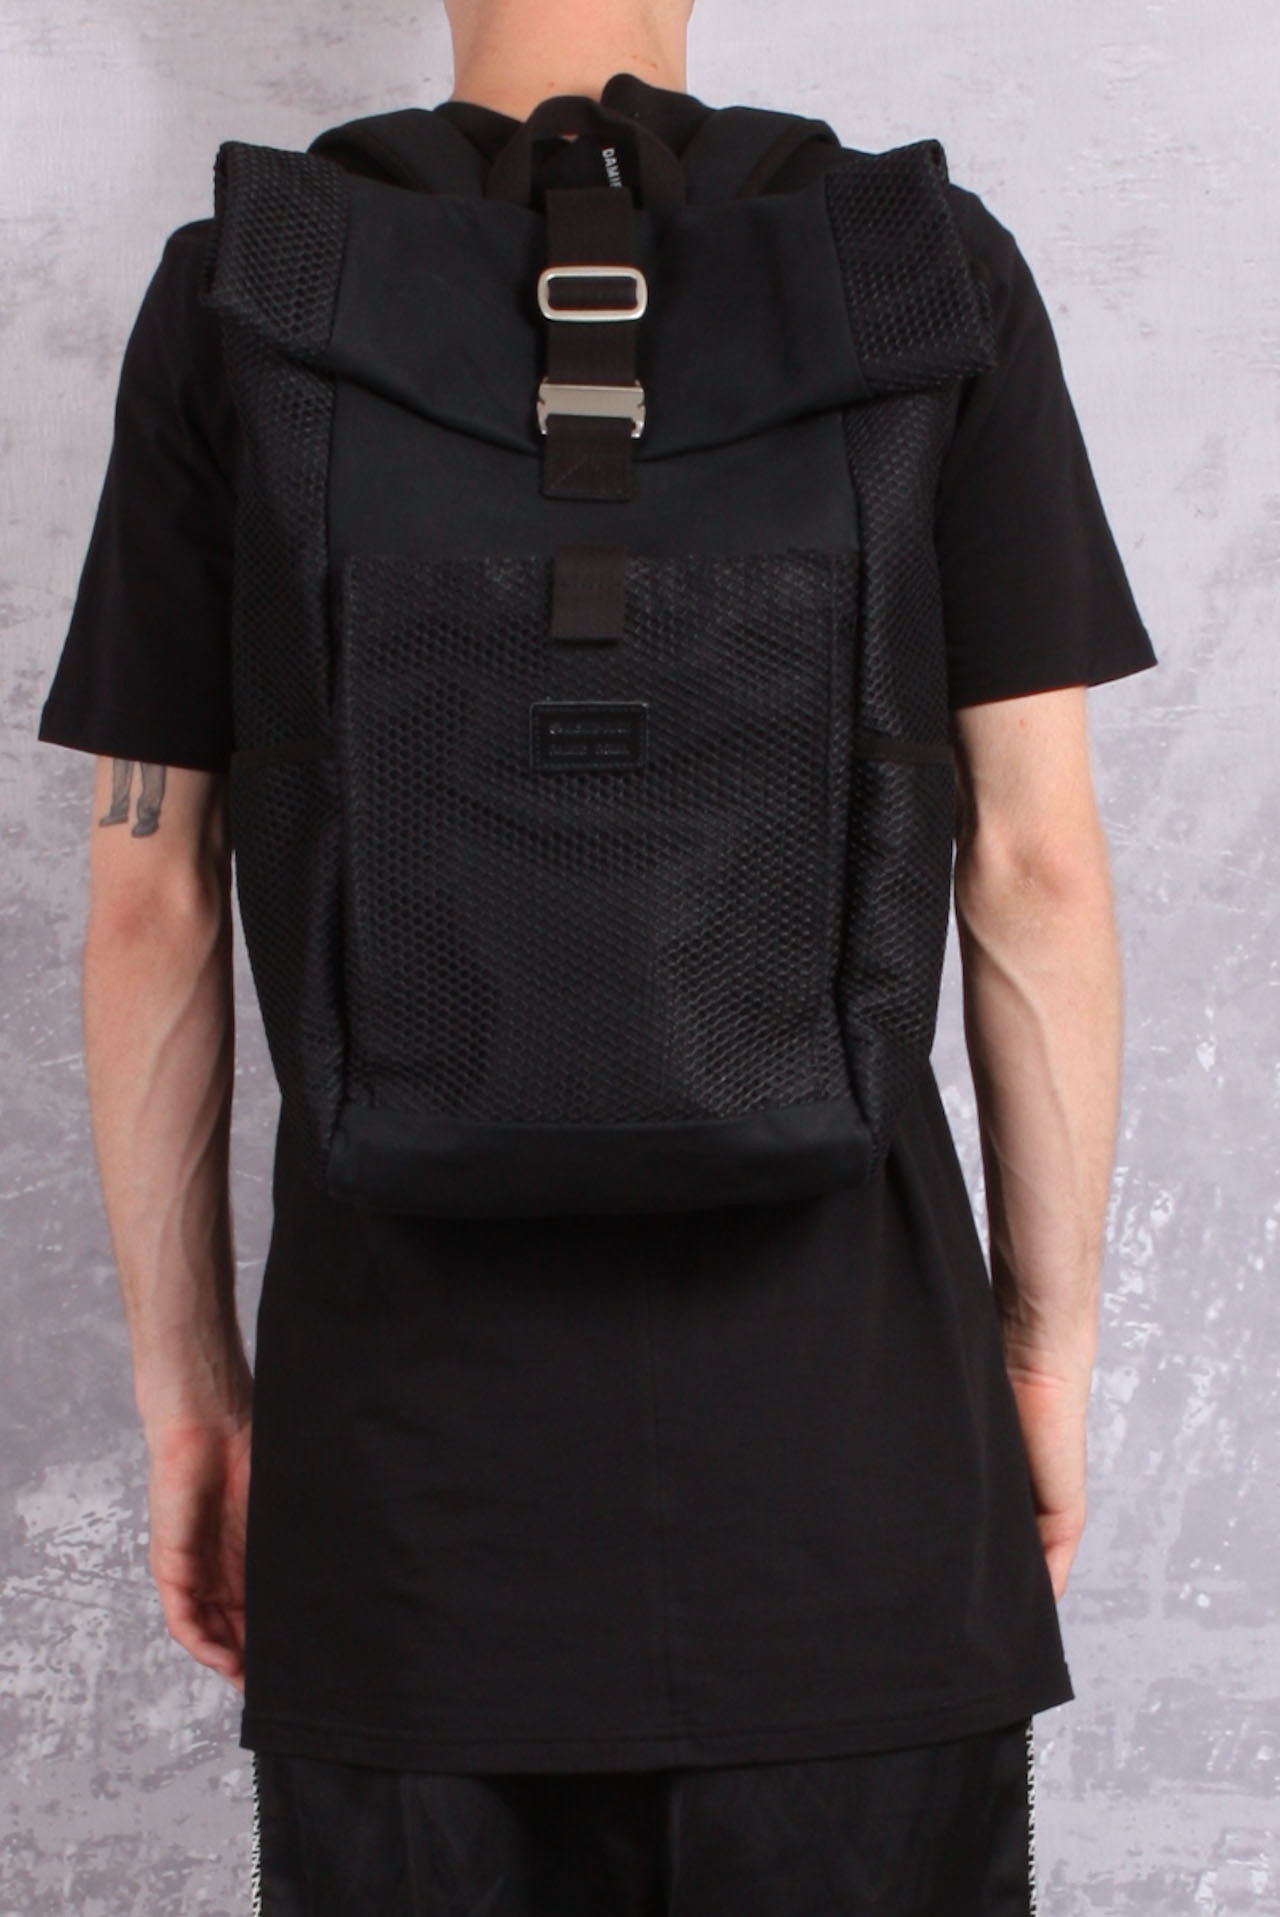 Damir Doma bag